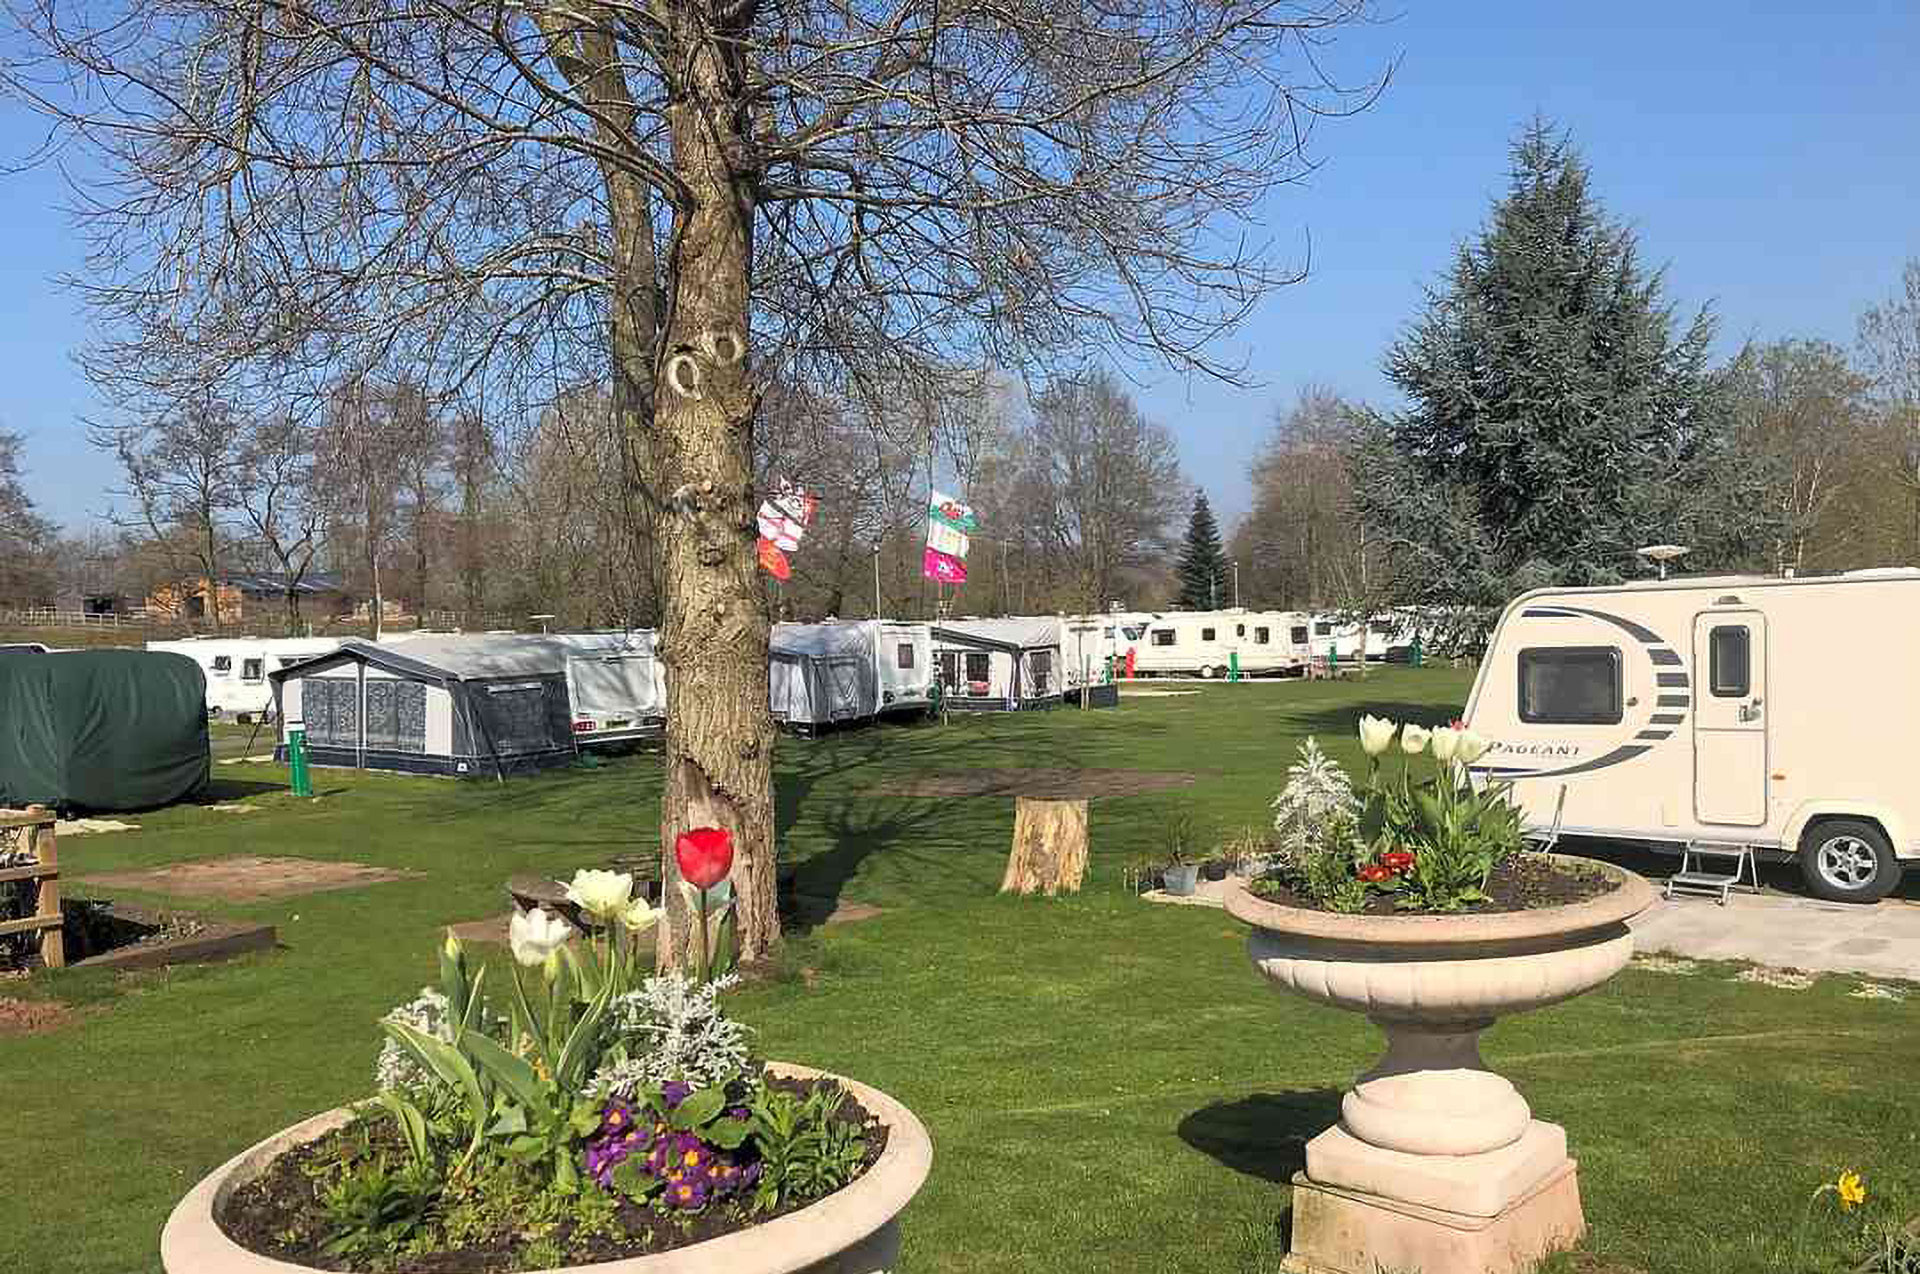 Glen Trothy Caravan and Camping Park